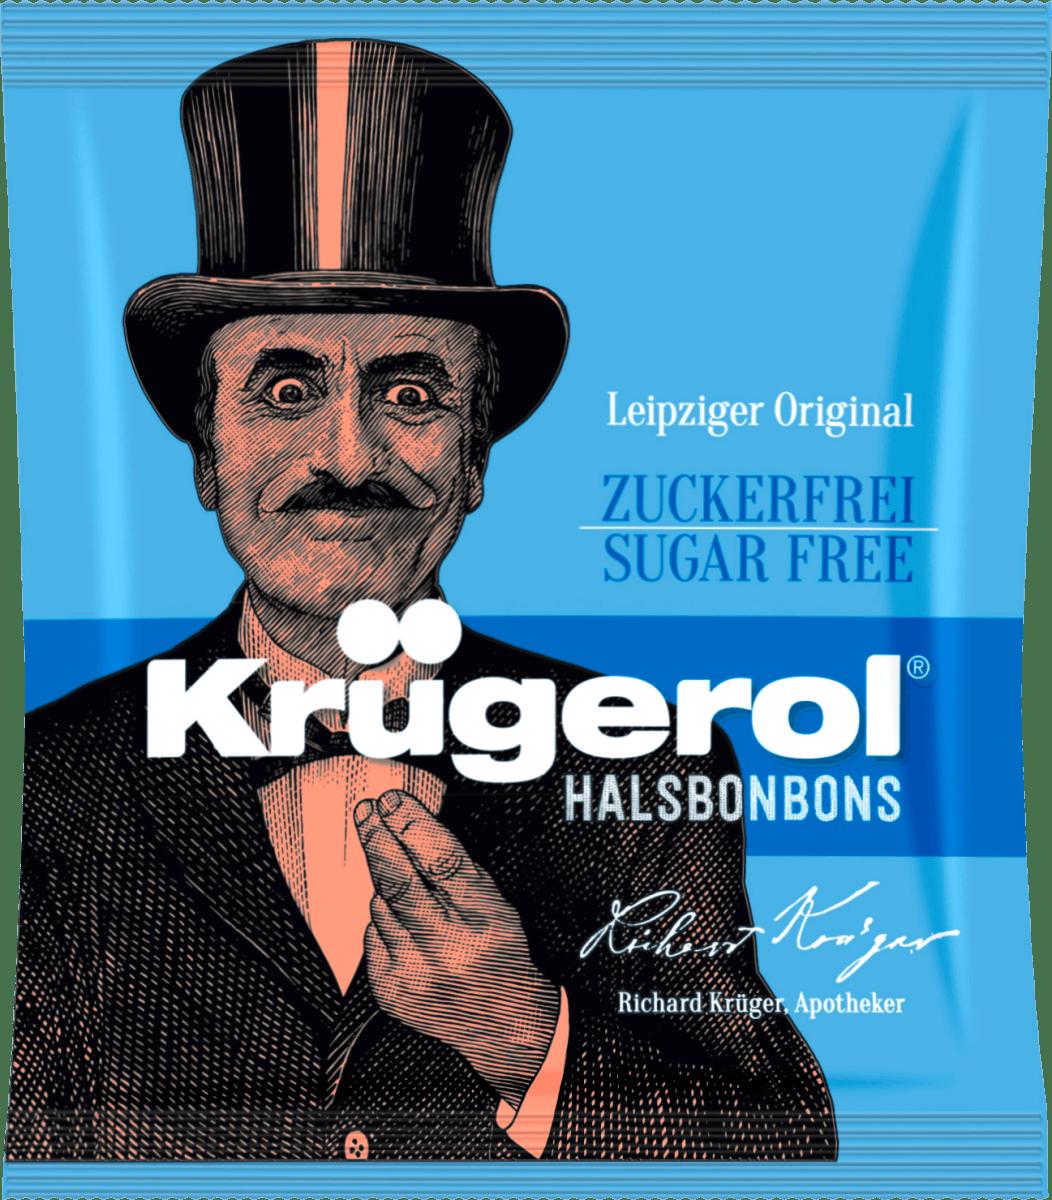 Леденцы Krugerol Halsbonbons Sugar Free 50 g